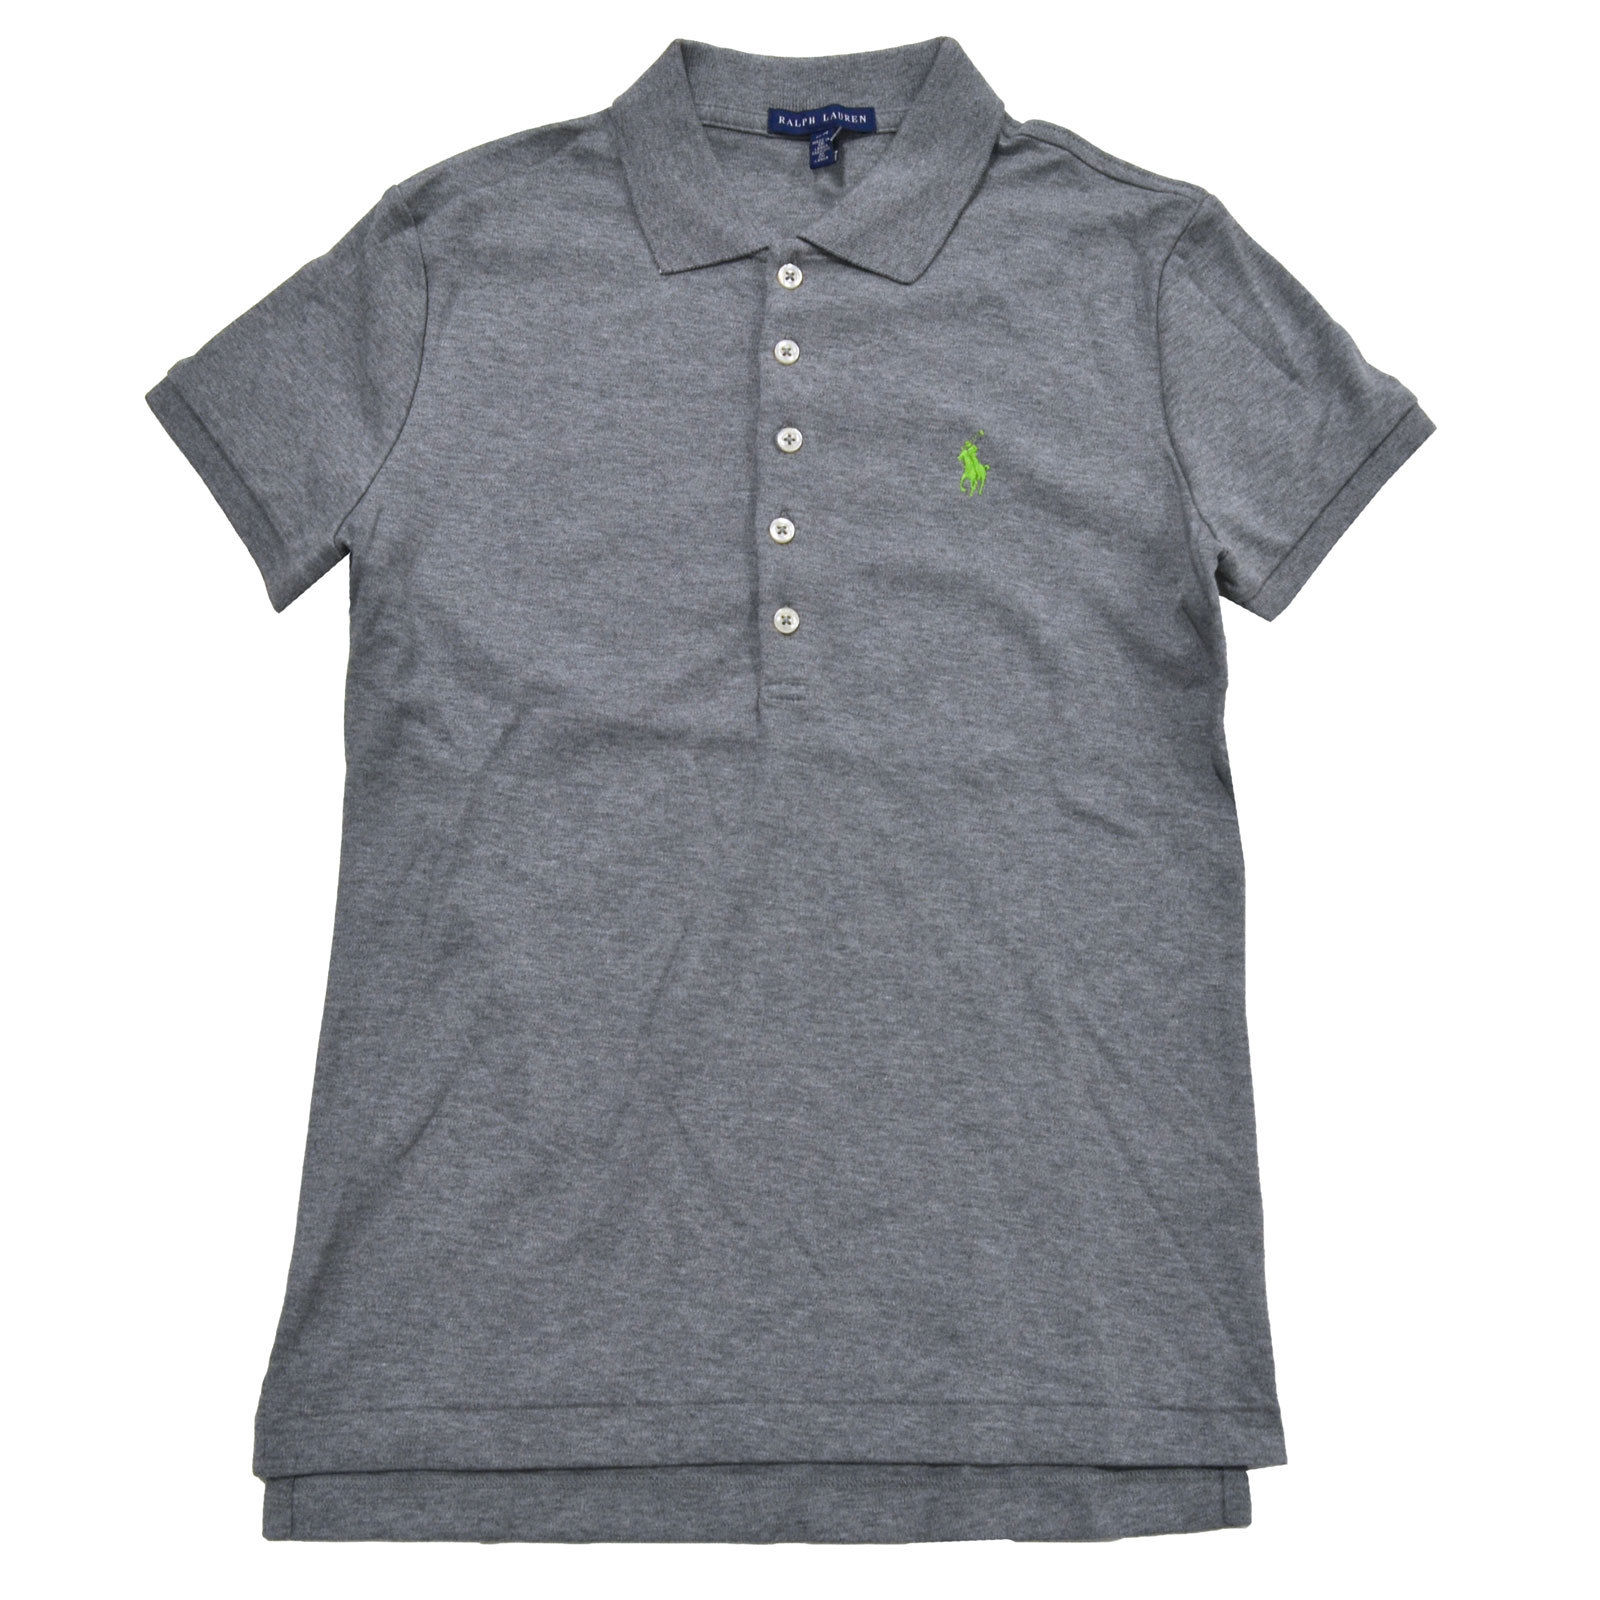 Polo Ralph Lauren Mens Classic Fit Interlock Polo Shirt 3 Button Size M or L